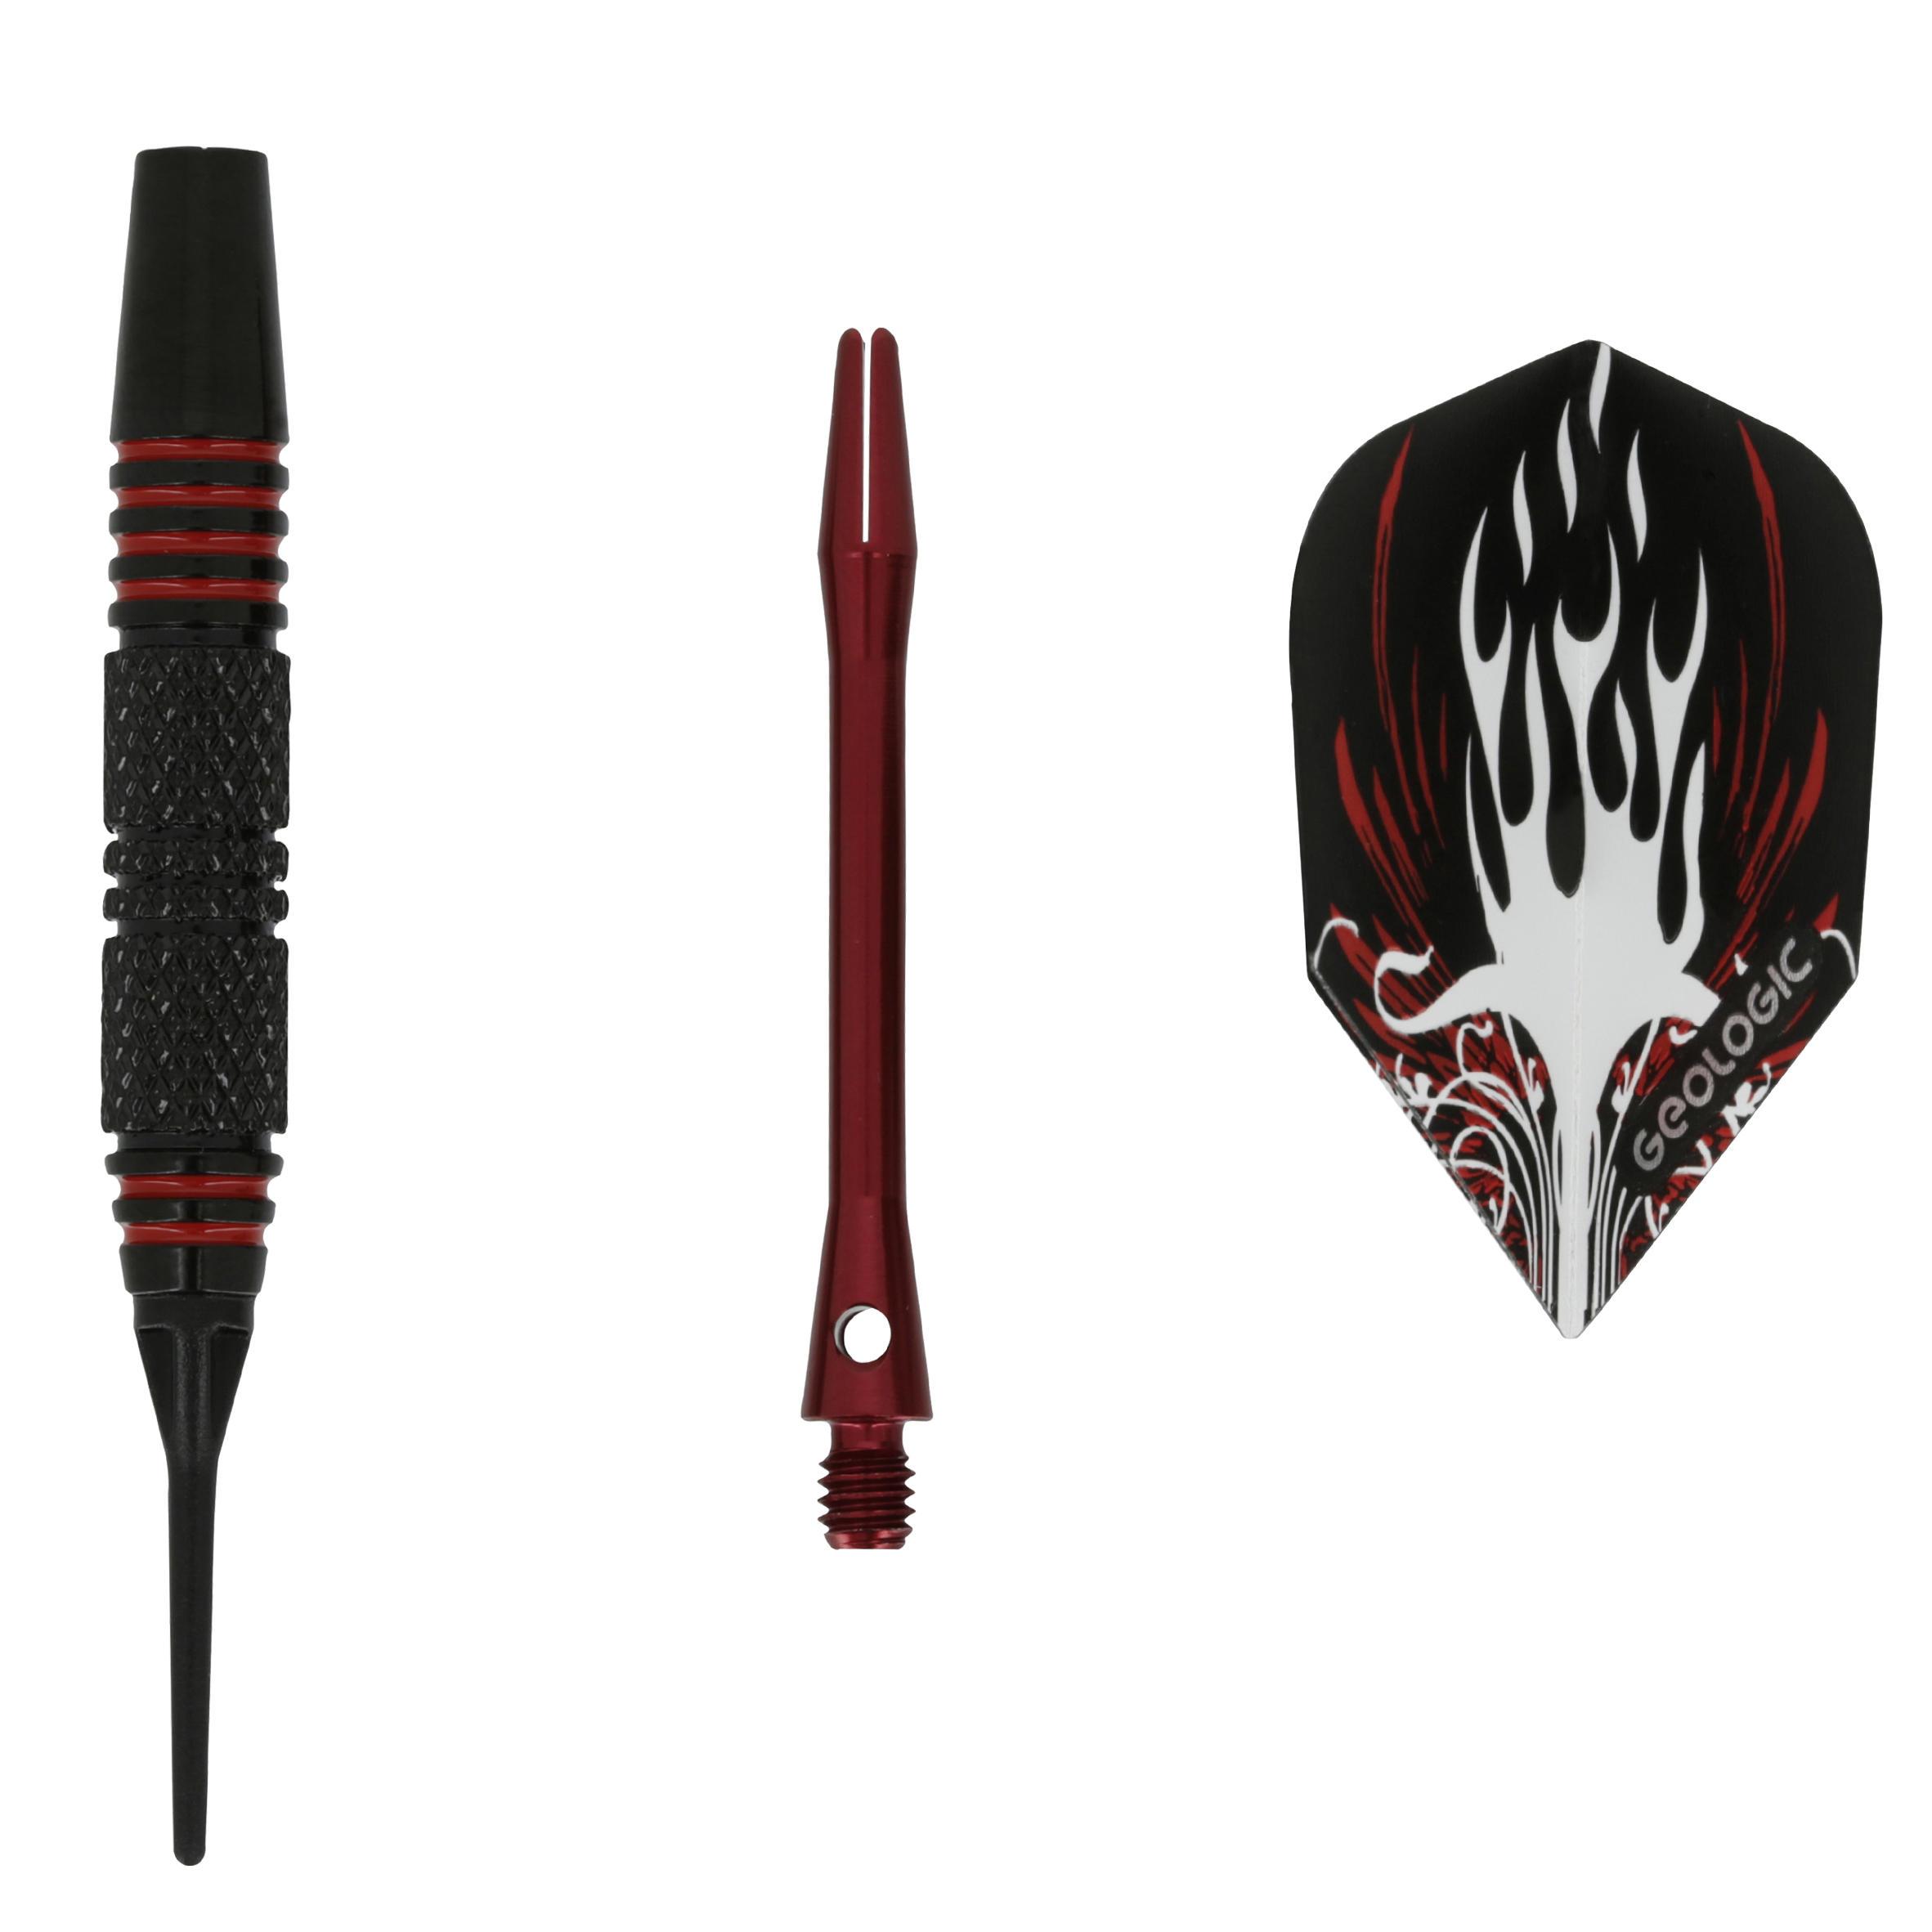 3 Falcon 500 Electronic Dartboard Darts